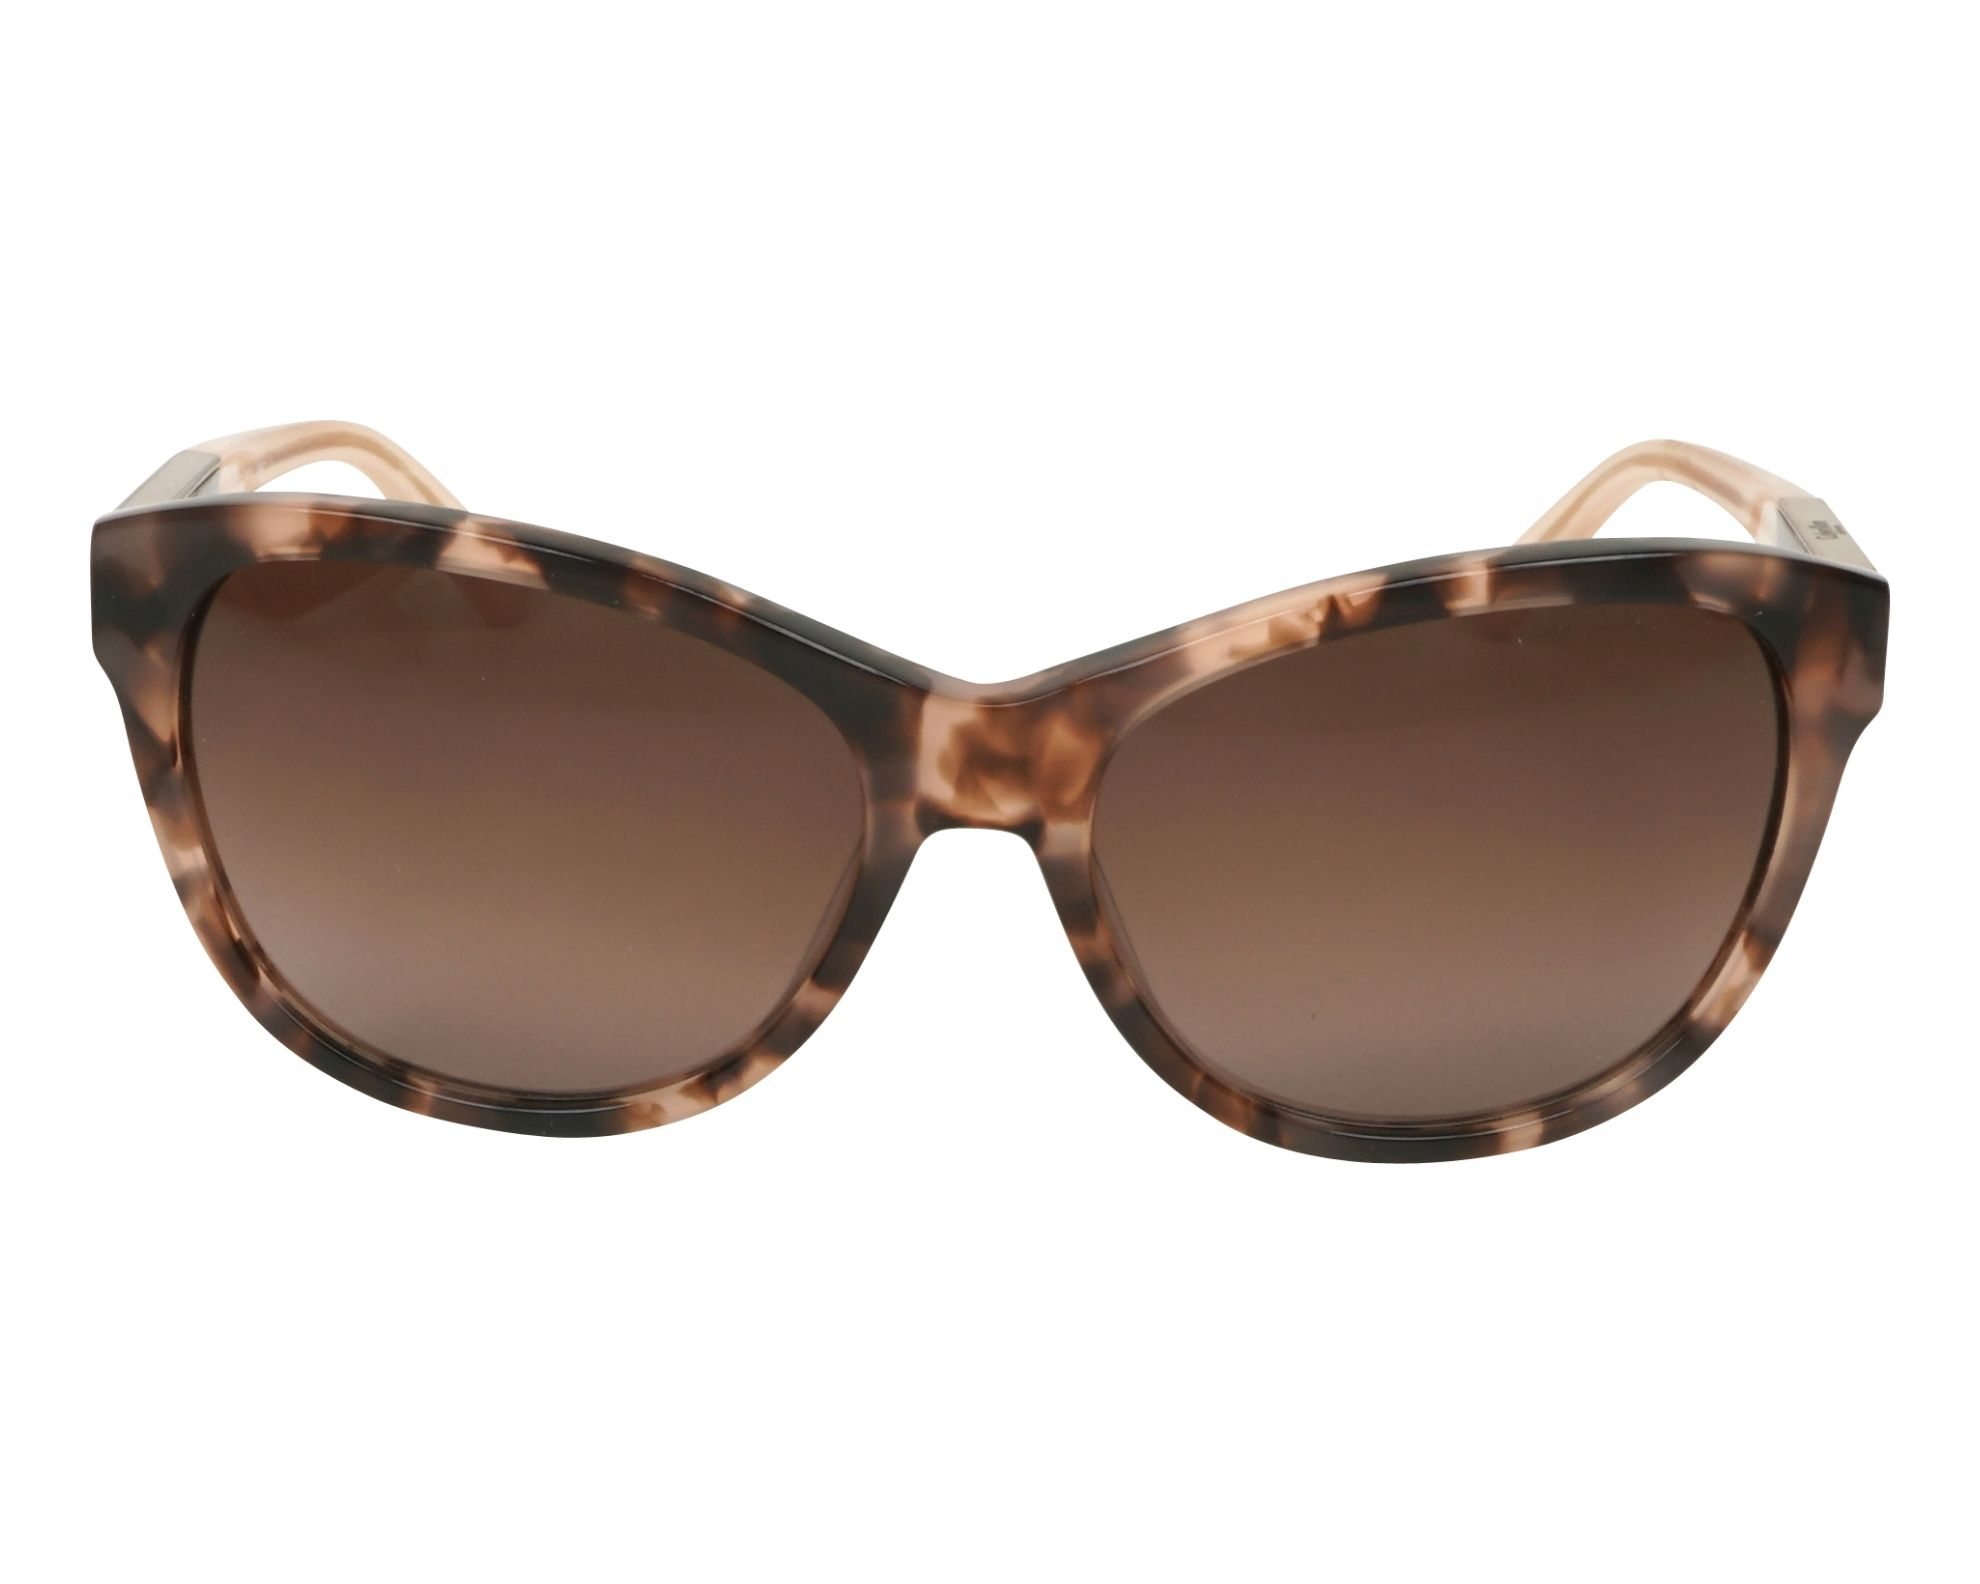 achat lunettes de soleil calvin klein ck 7901 s 602 visionet. Black Bedroom Furniture Sets. Home Design Ideas